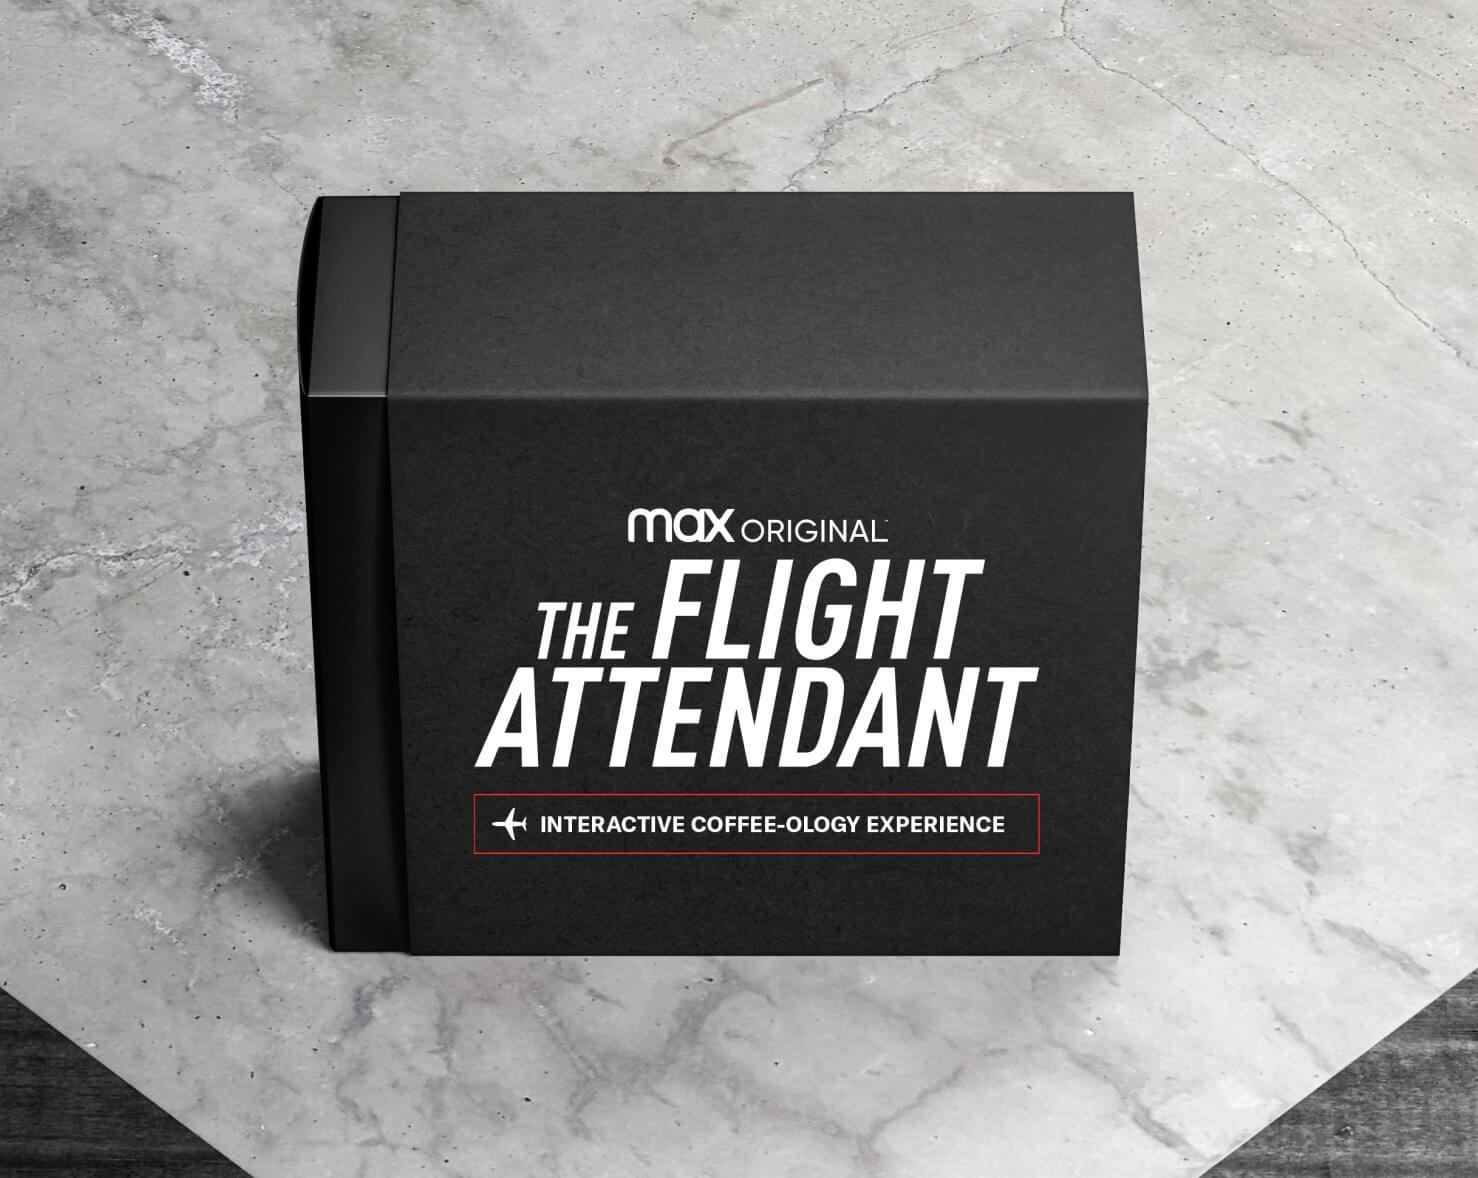 The Flight Attendant Kit